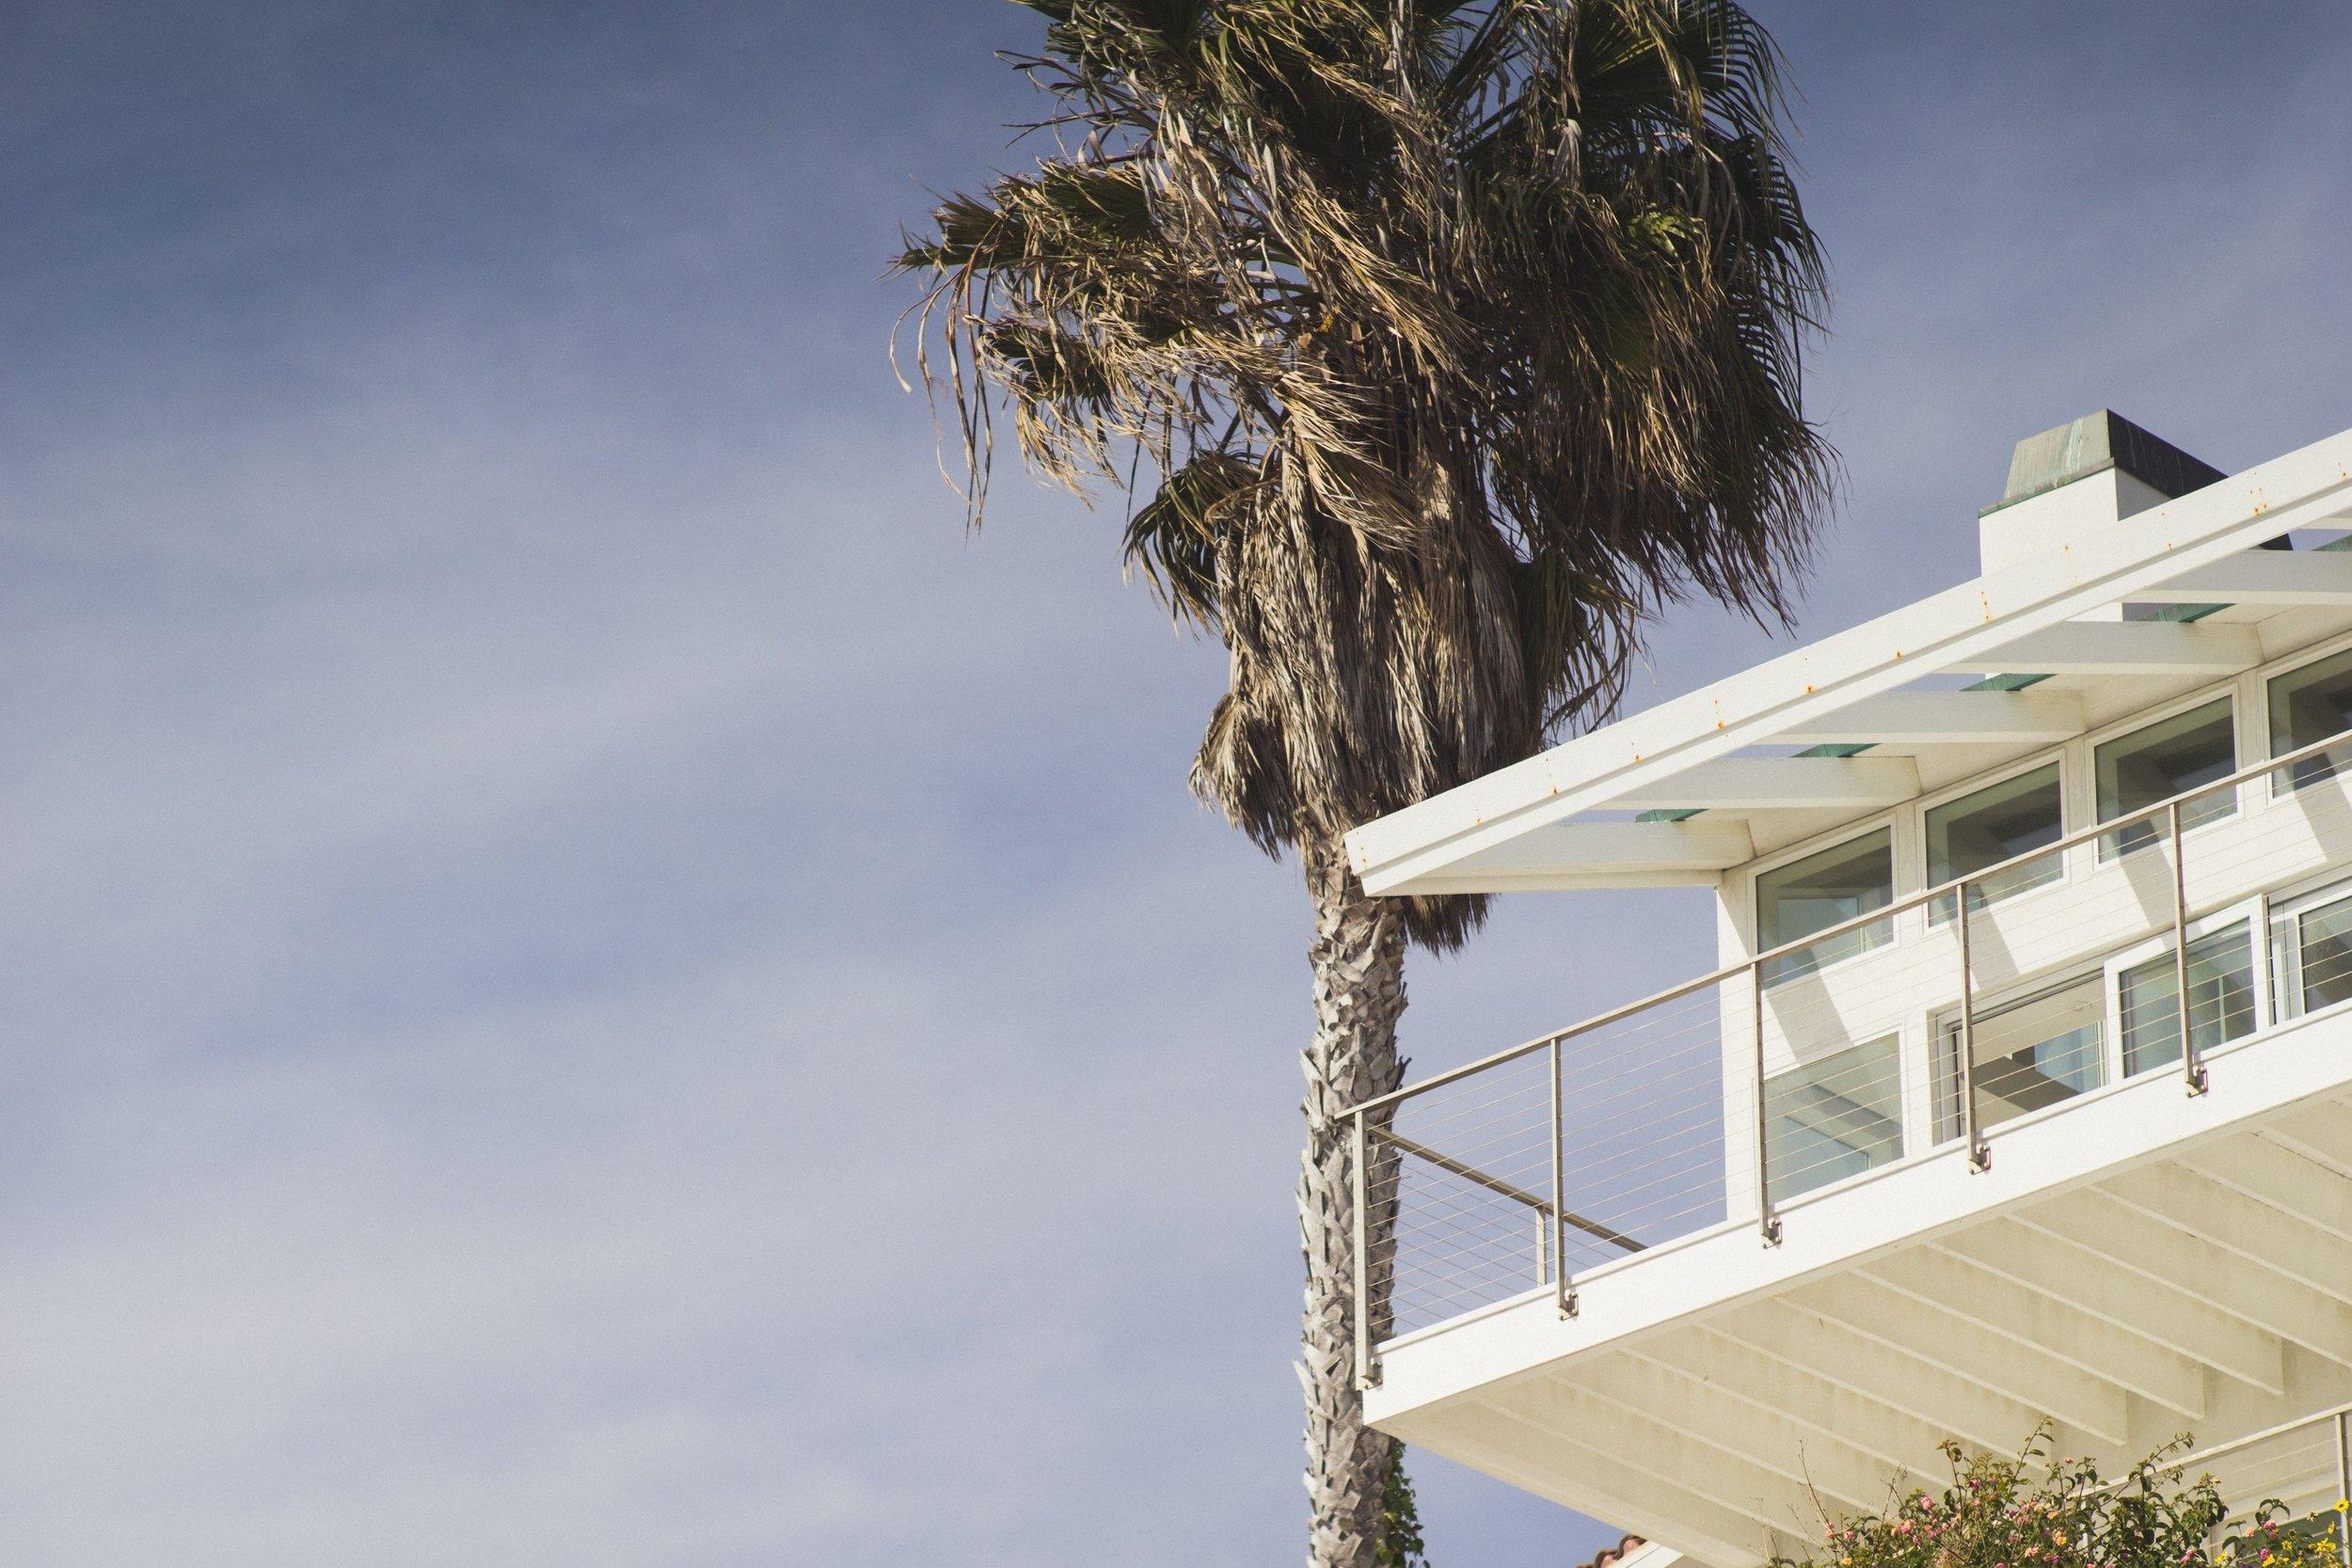 rentals • property management - vacation properties